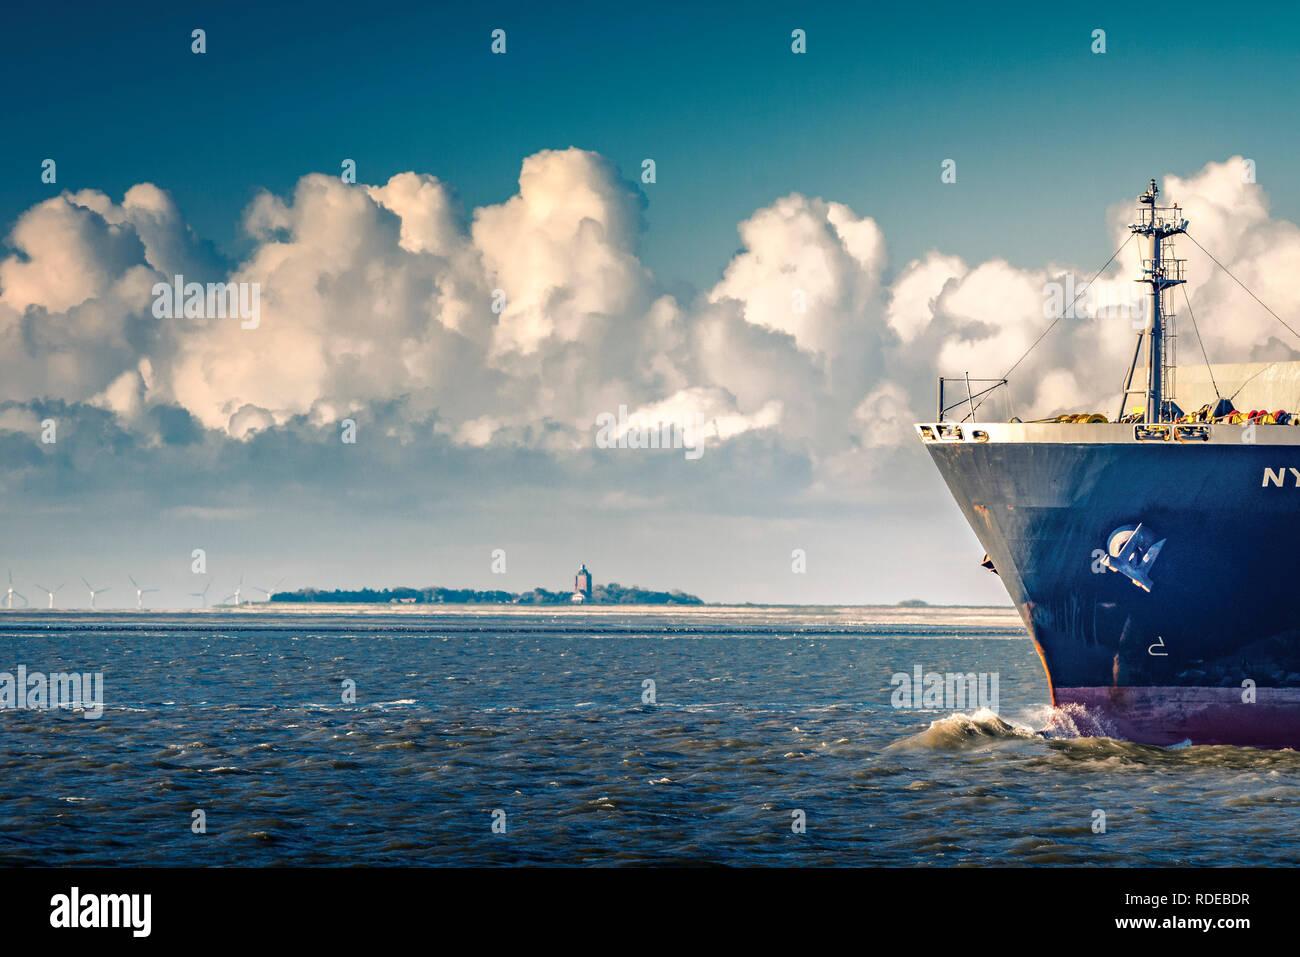 Deutschland, Cuxhaven, Elbe, Elbmündung, Insel, Neuwerk - Stock Image